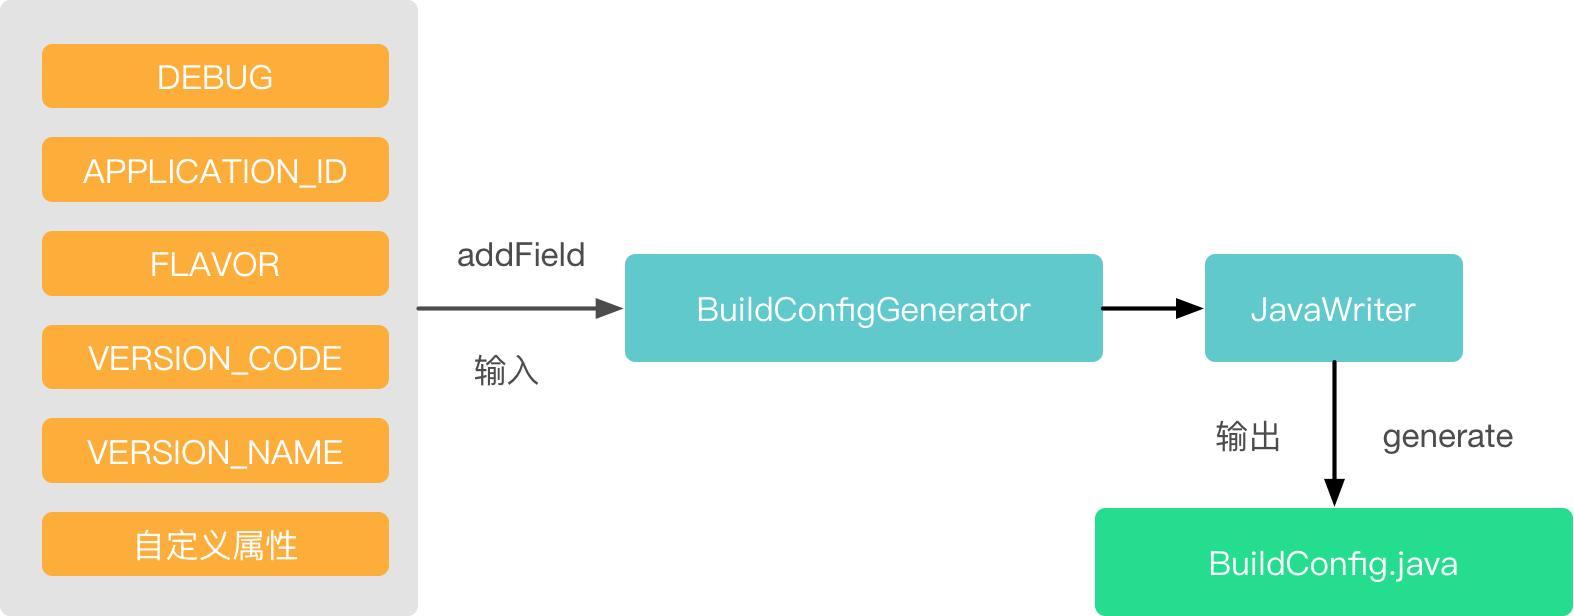 generateDebugBuildConfig